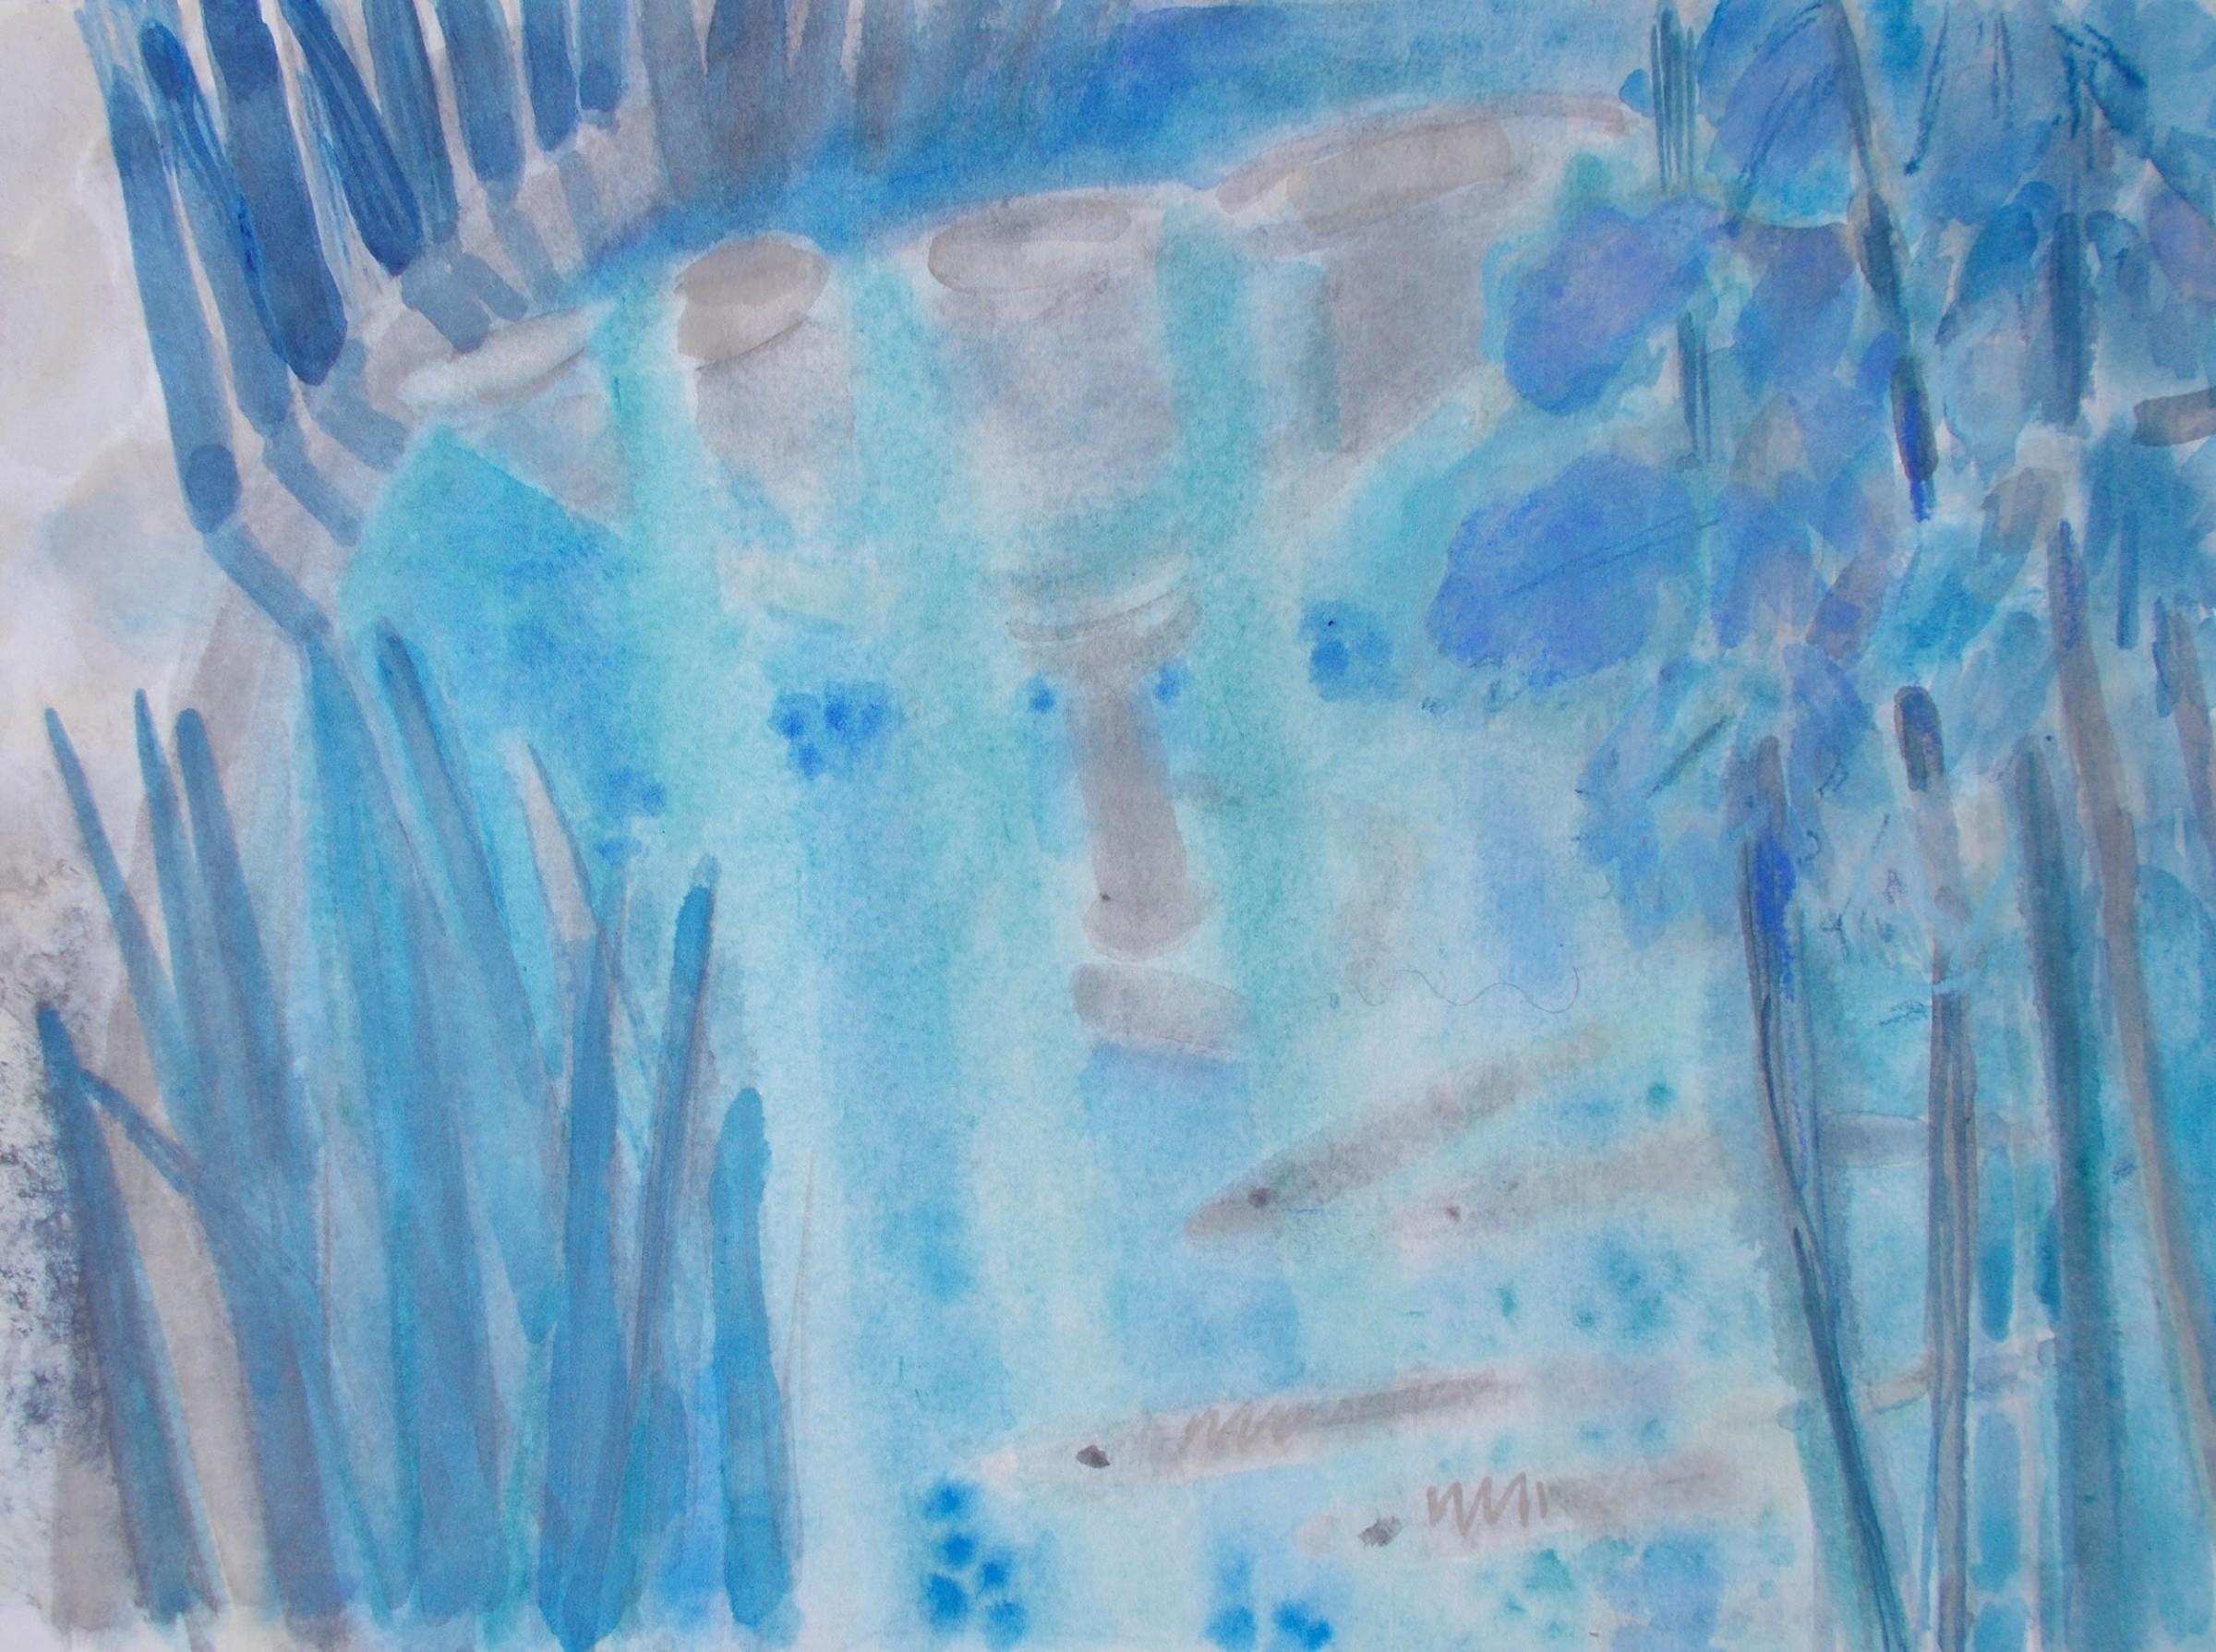 "<span class=""link fancybox-details-link""><a href=""/artists/80-anne-marlow/works/12093-anne-marlow-the-cool-pool/"">View Detail Page</a></span><div class=""artist""><span class=""artist""><strong>Anne Marlow</strong></span></div><div class=""title""><em>The Cool Pool</em></div><div class=""medium"">watercolour</div><div class=""dimensions"">Frame: 45 x 57 cm<br /> Artwork: 31 x 42 cm</div><div class=""price"">£365.00</div>"